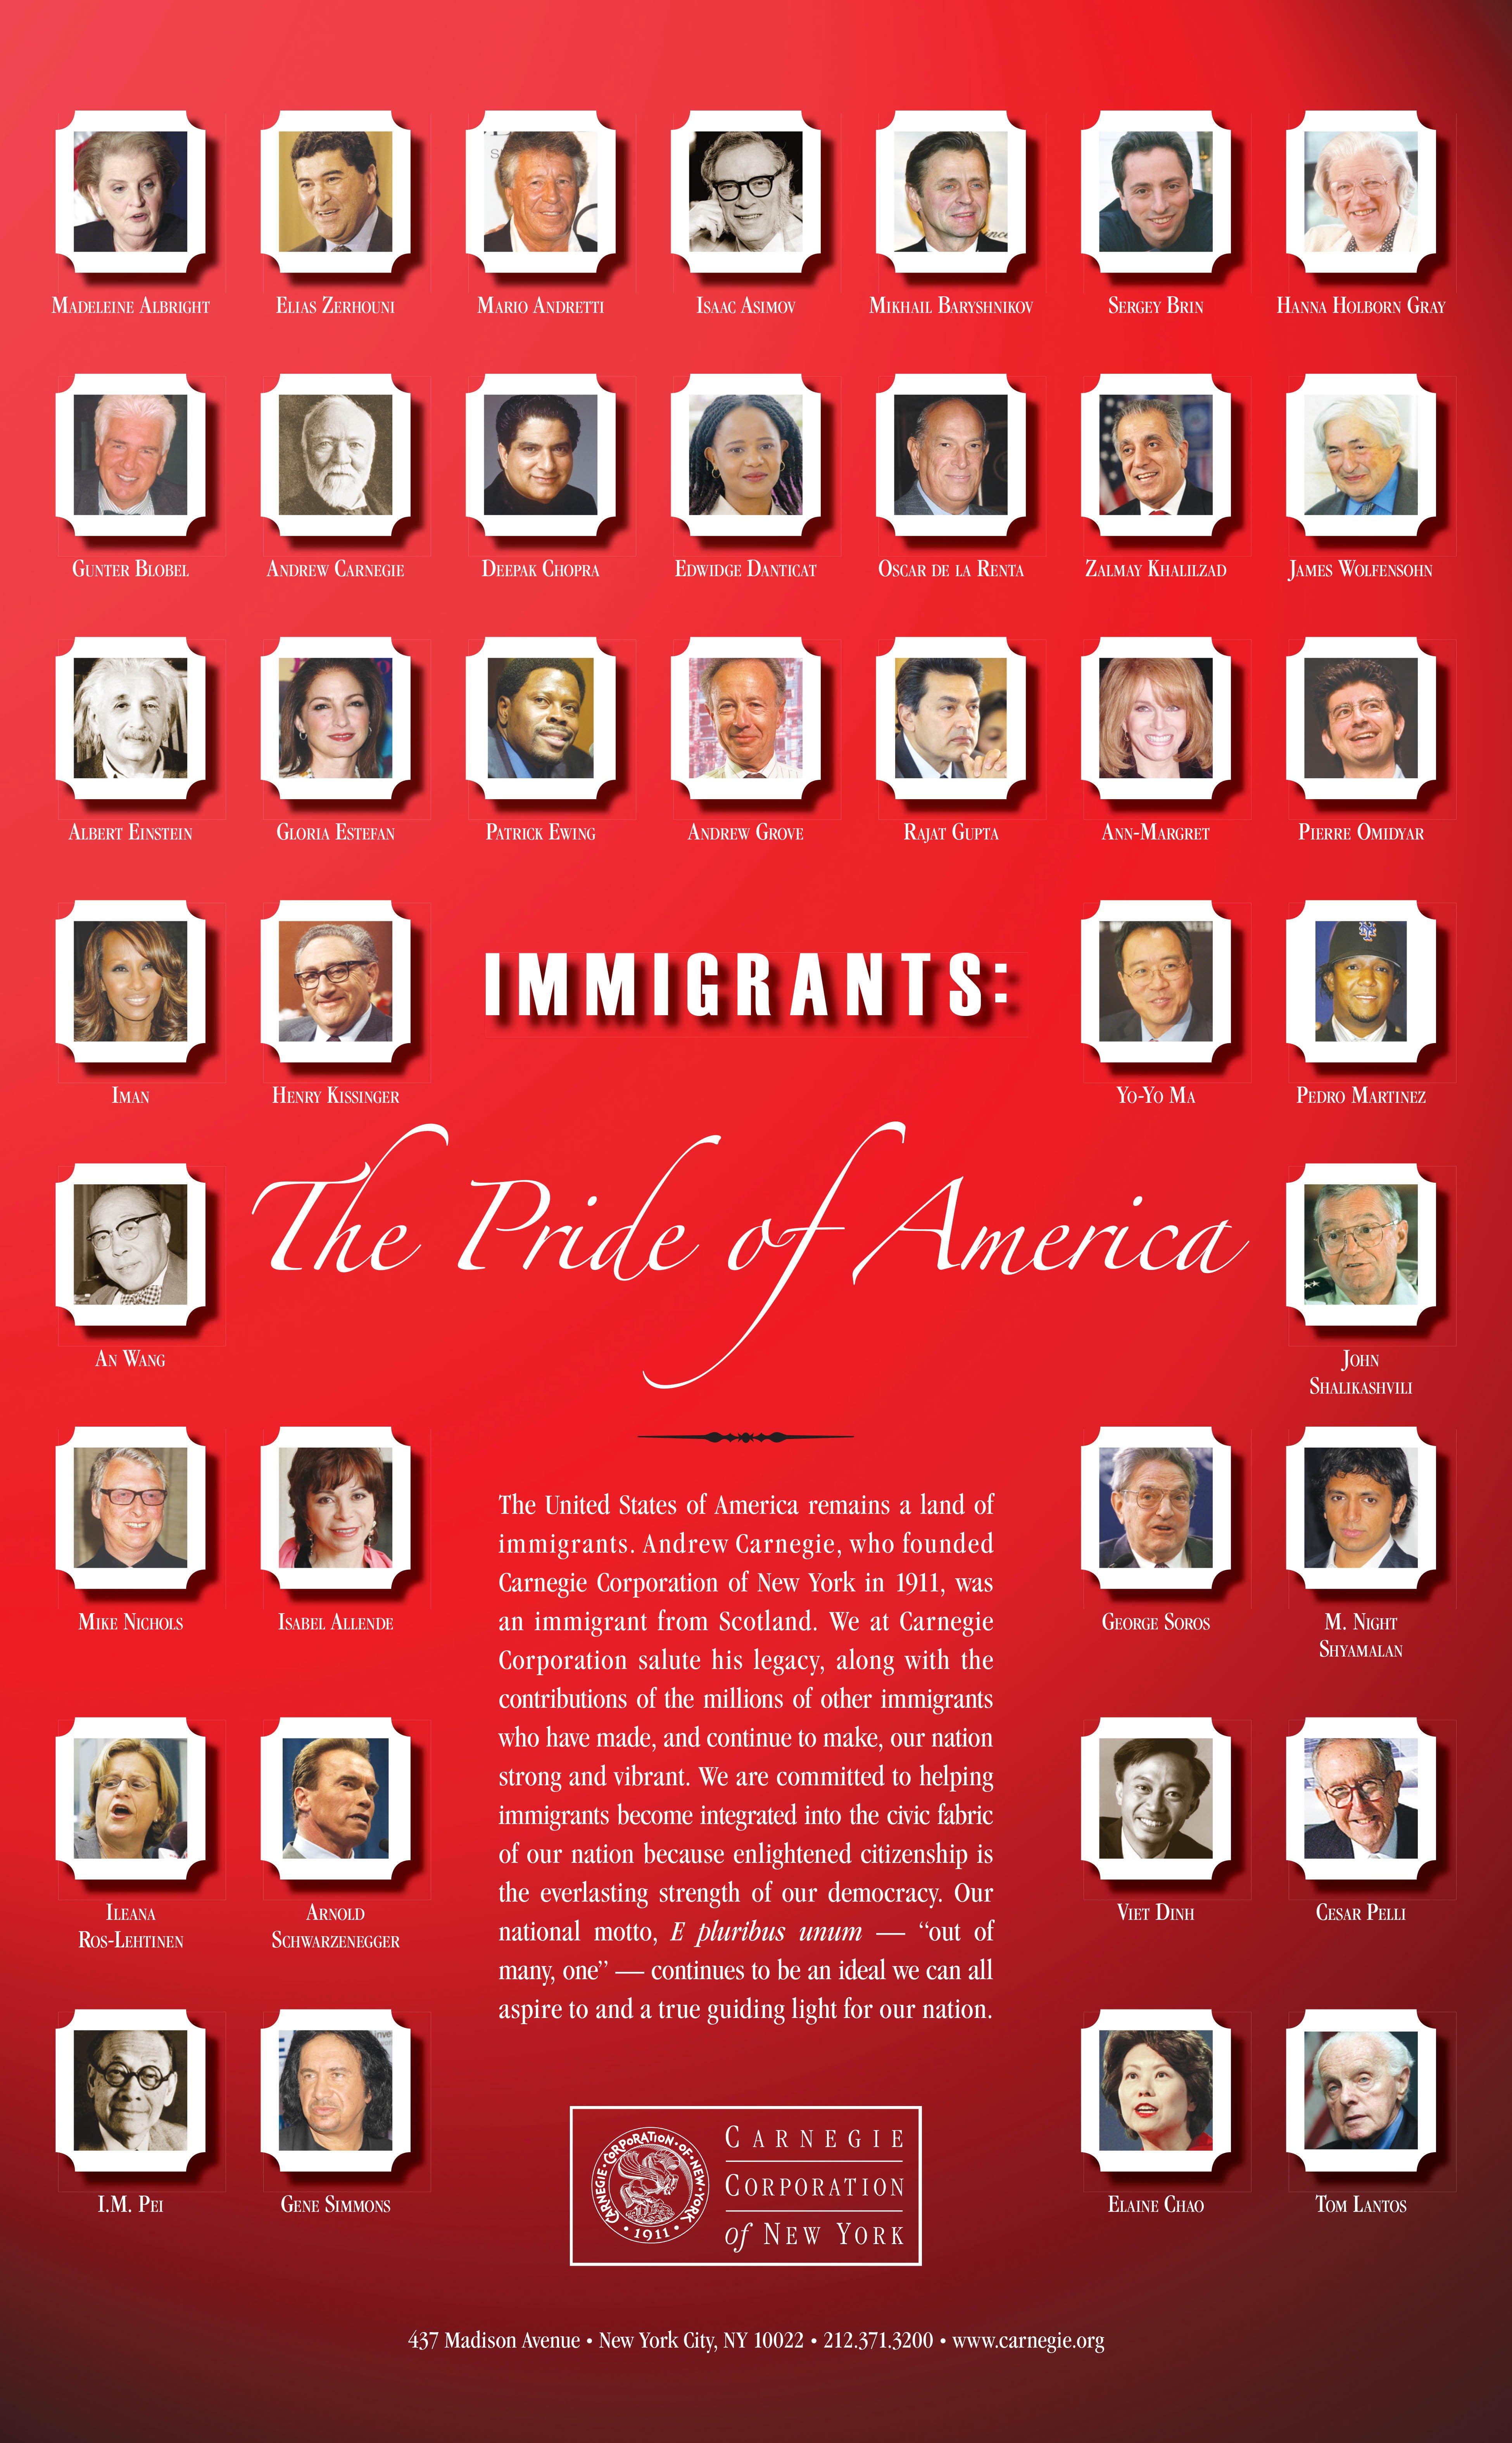 Immigrants, The Pride of America